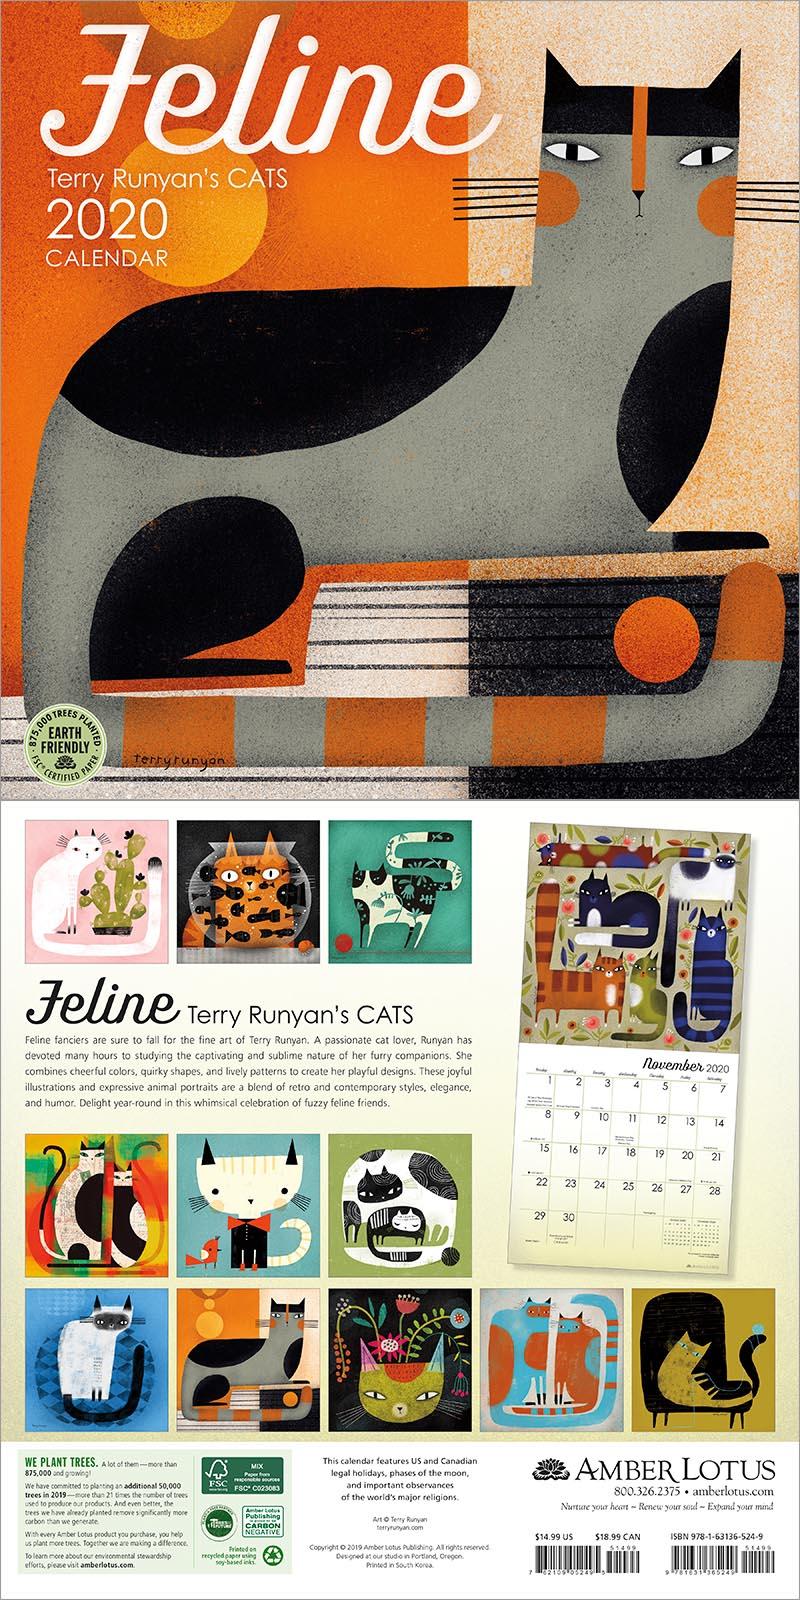 Feline 2020 Wall Calendar